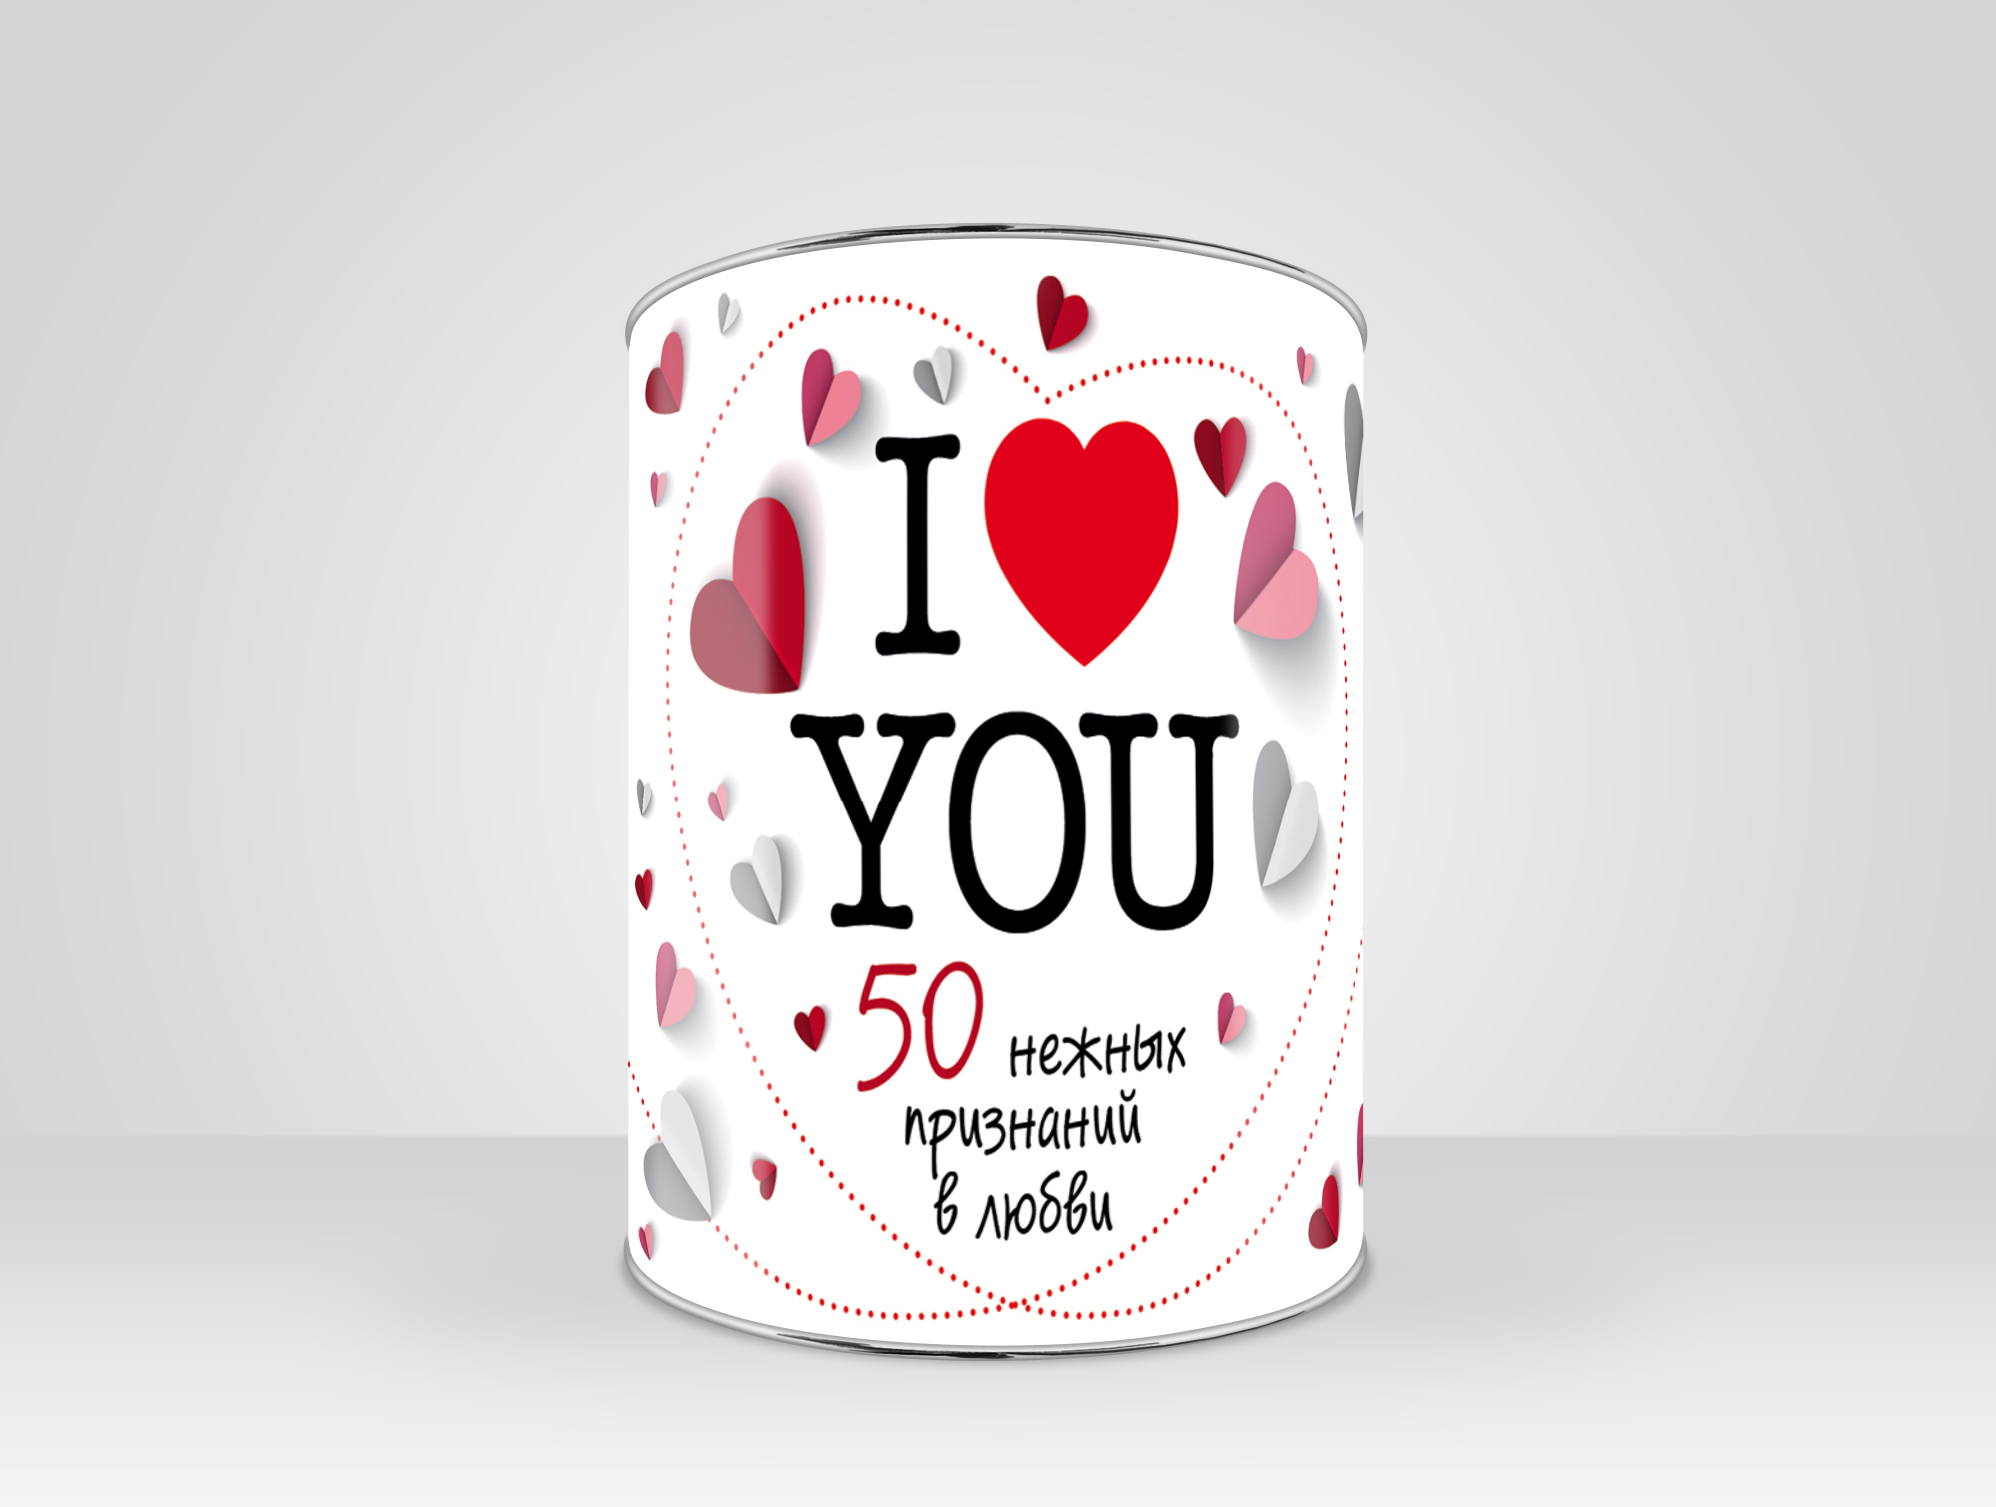 Я тебя люблю! I Love you. 50 нежных признаний в любви